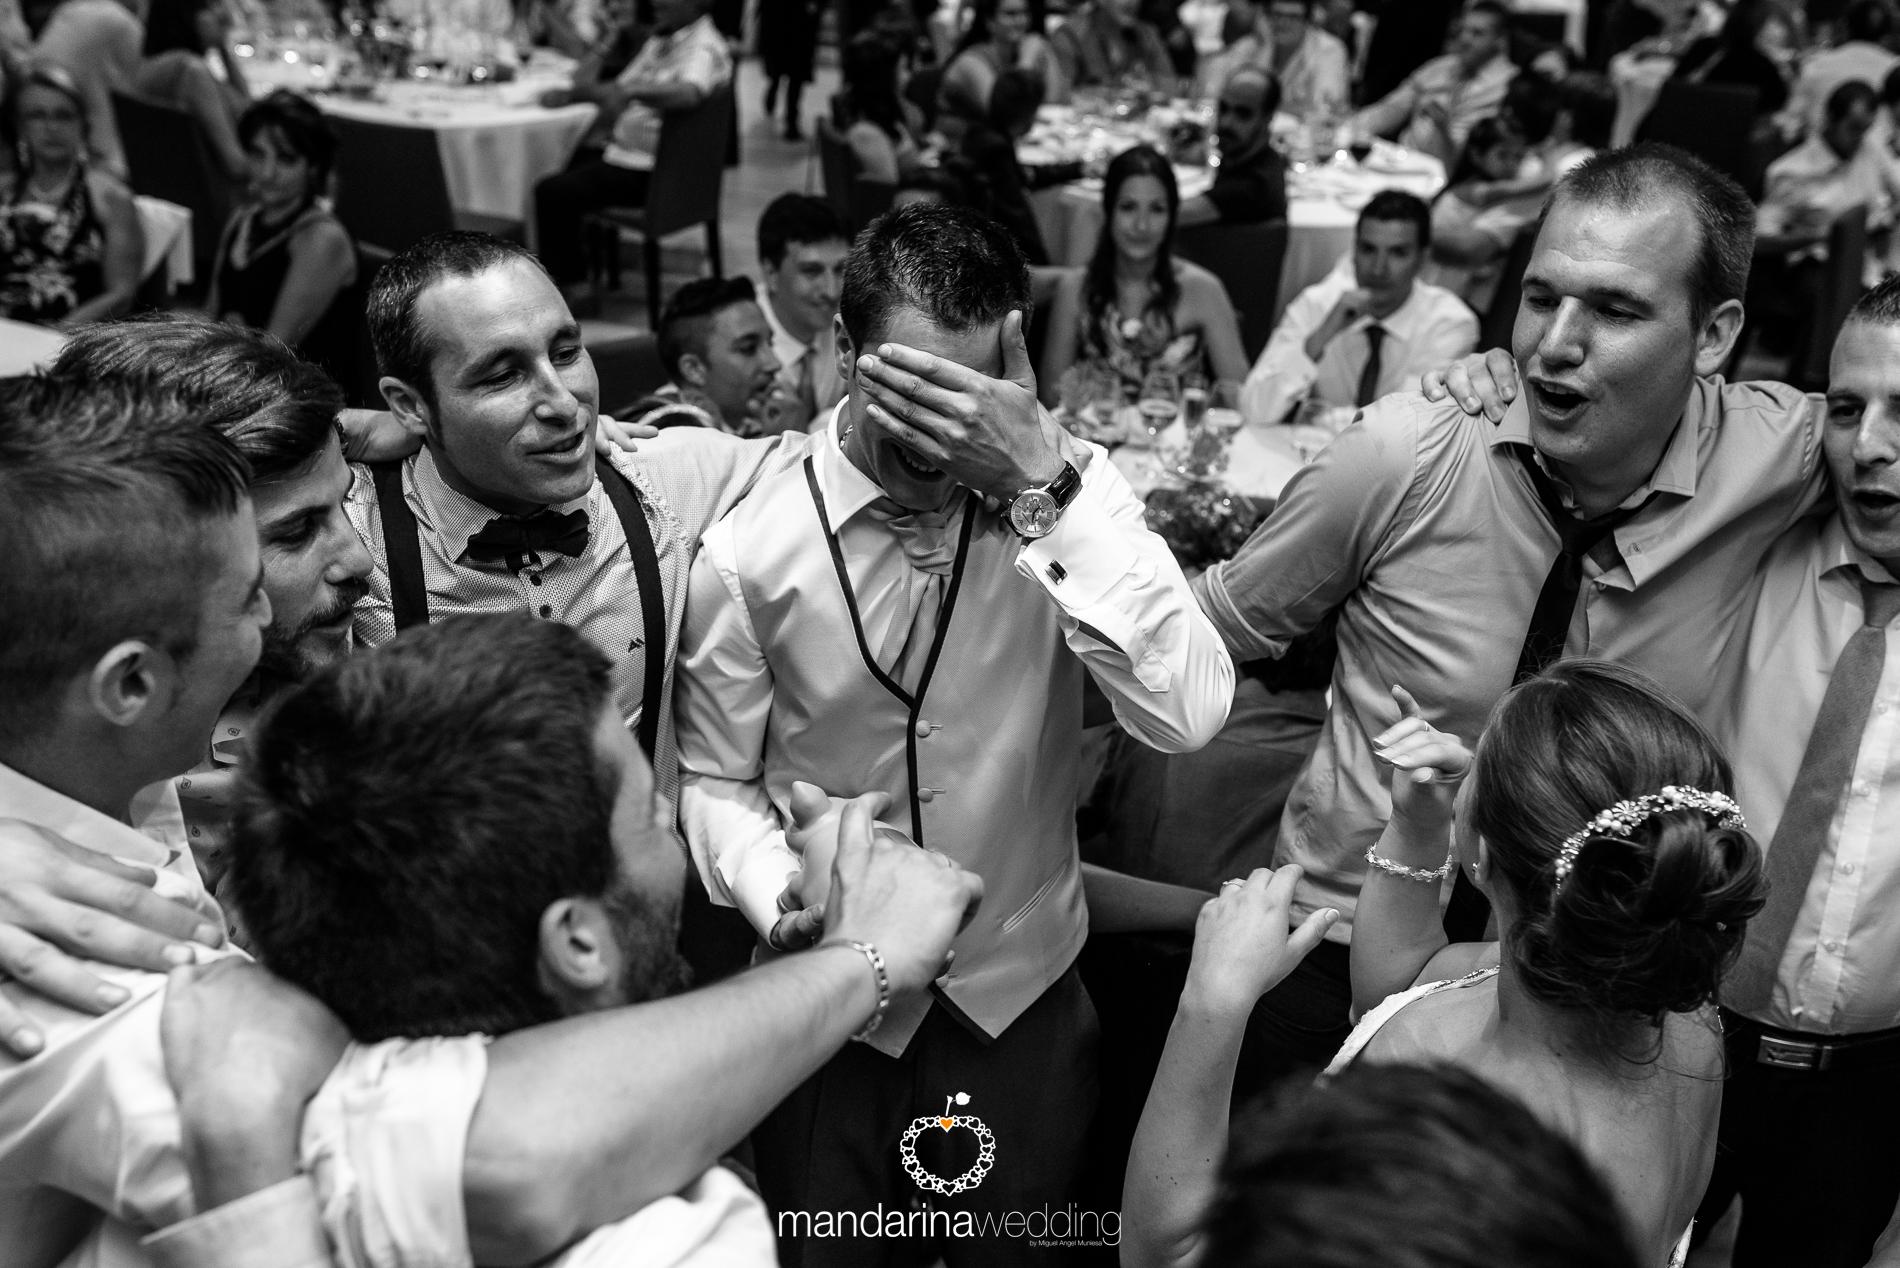 mandarina wedding, mejores fotografos boda, fotografo zaragoza, fotografo huesca, fotografo soria, fotografo lerida_42